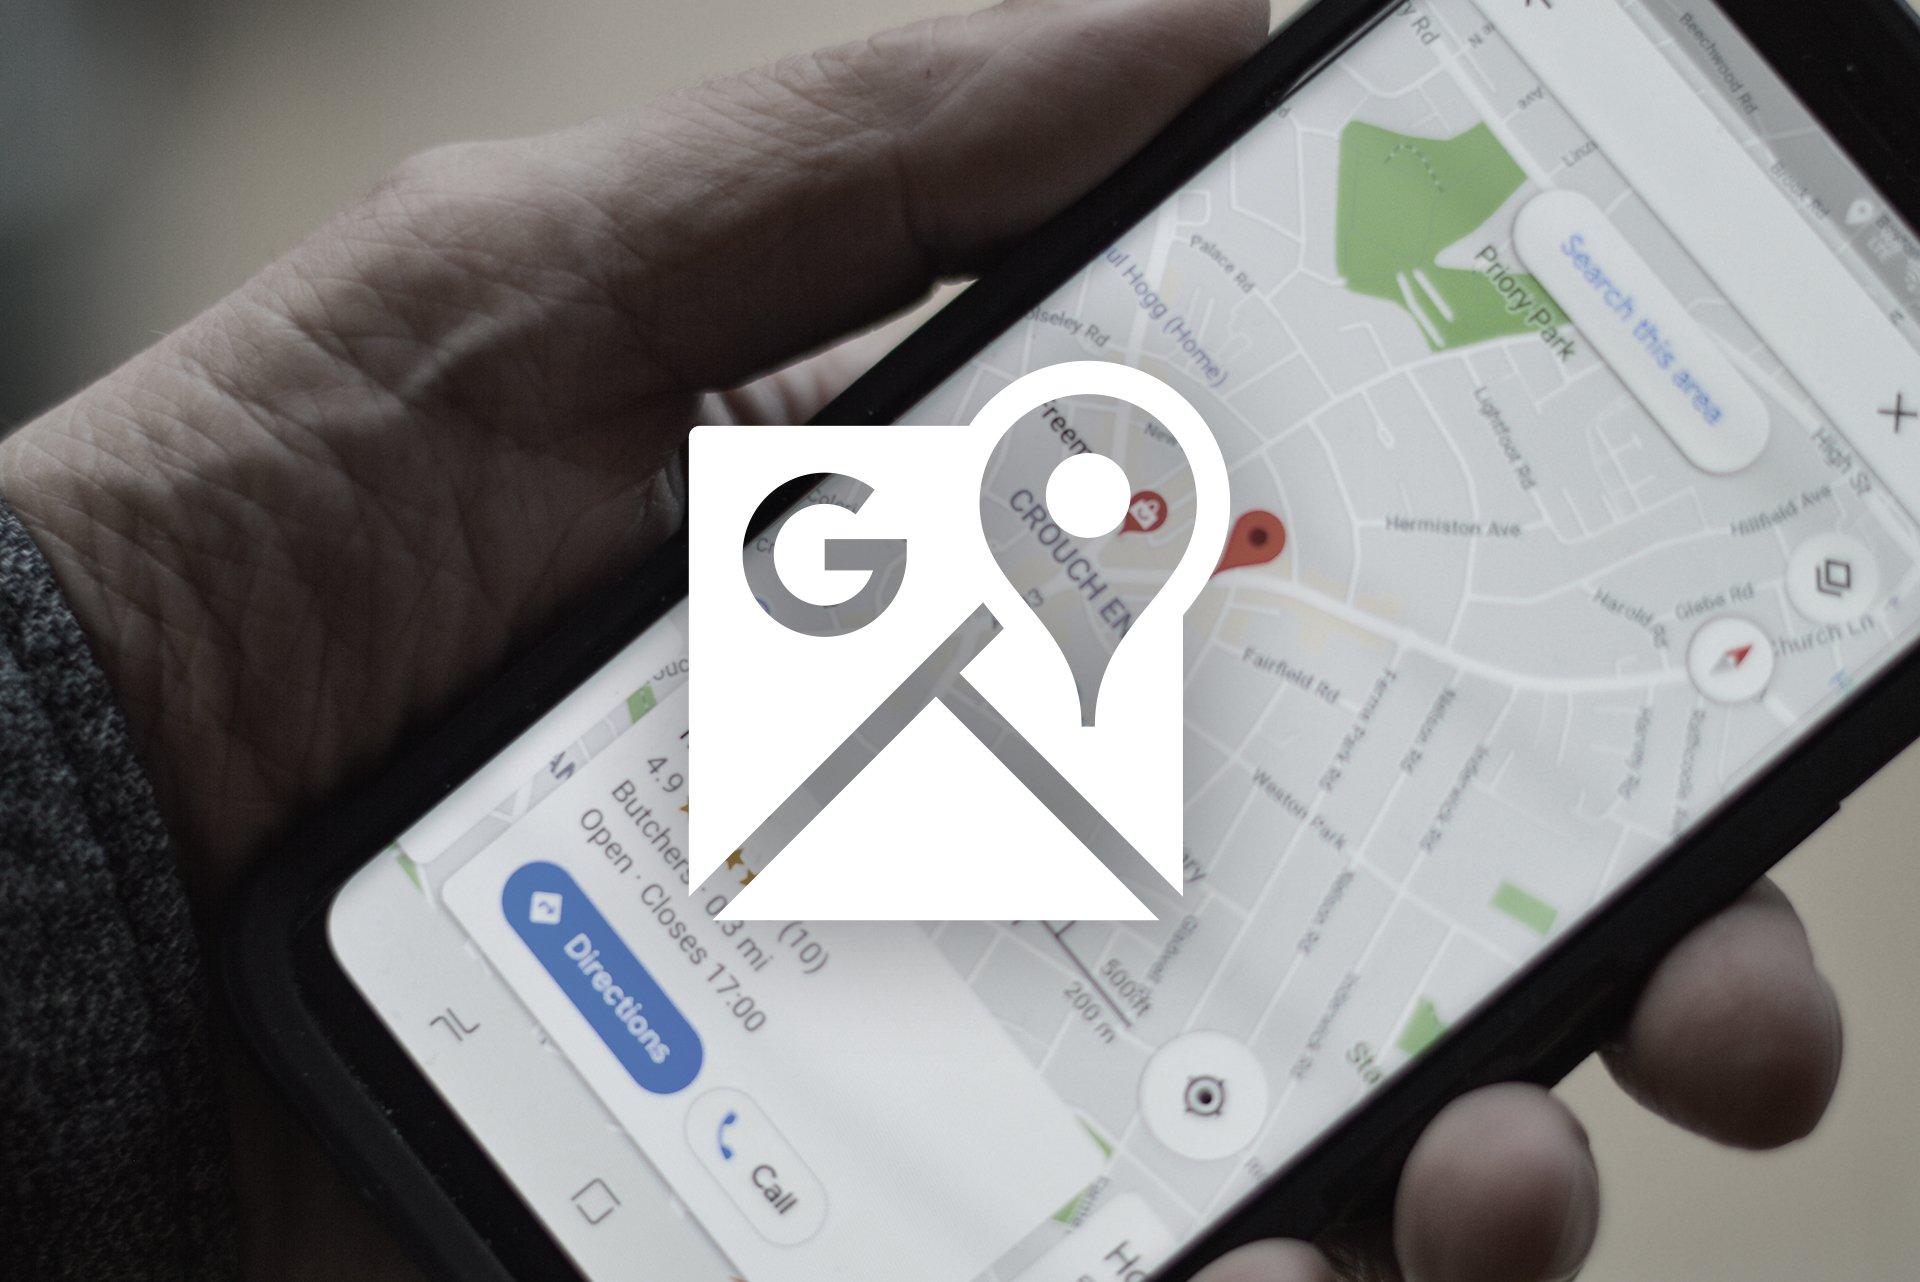 Google Moja Firma GoogleMaps